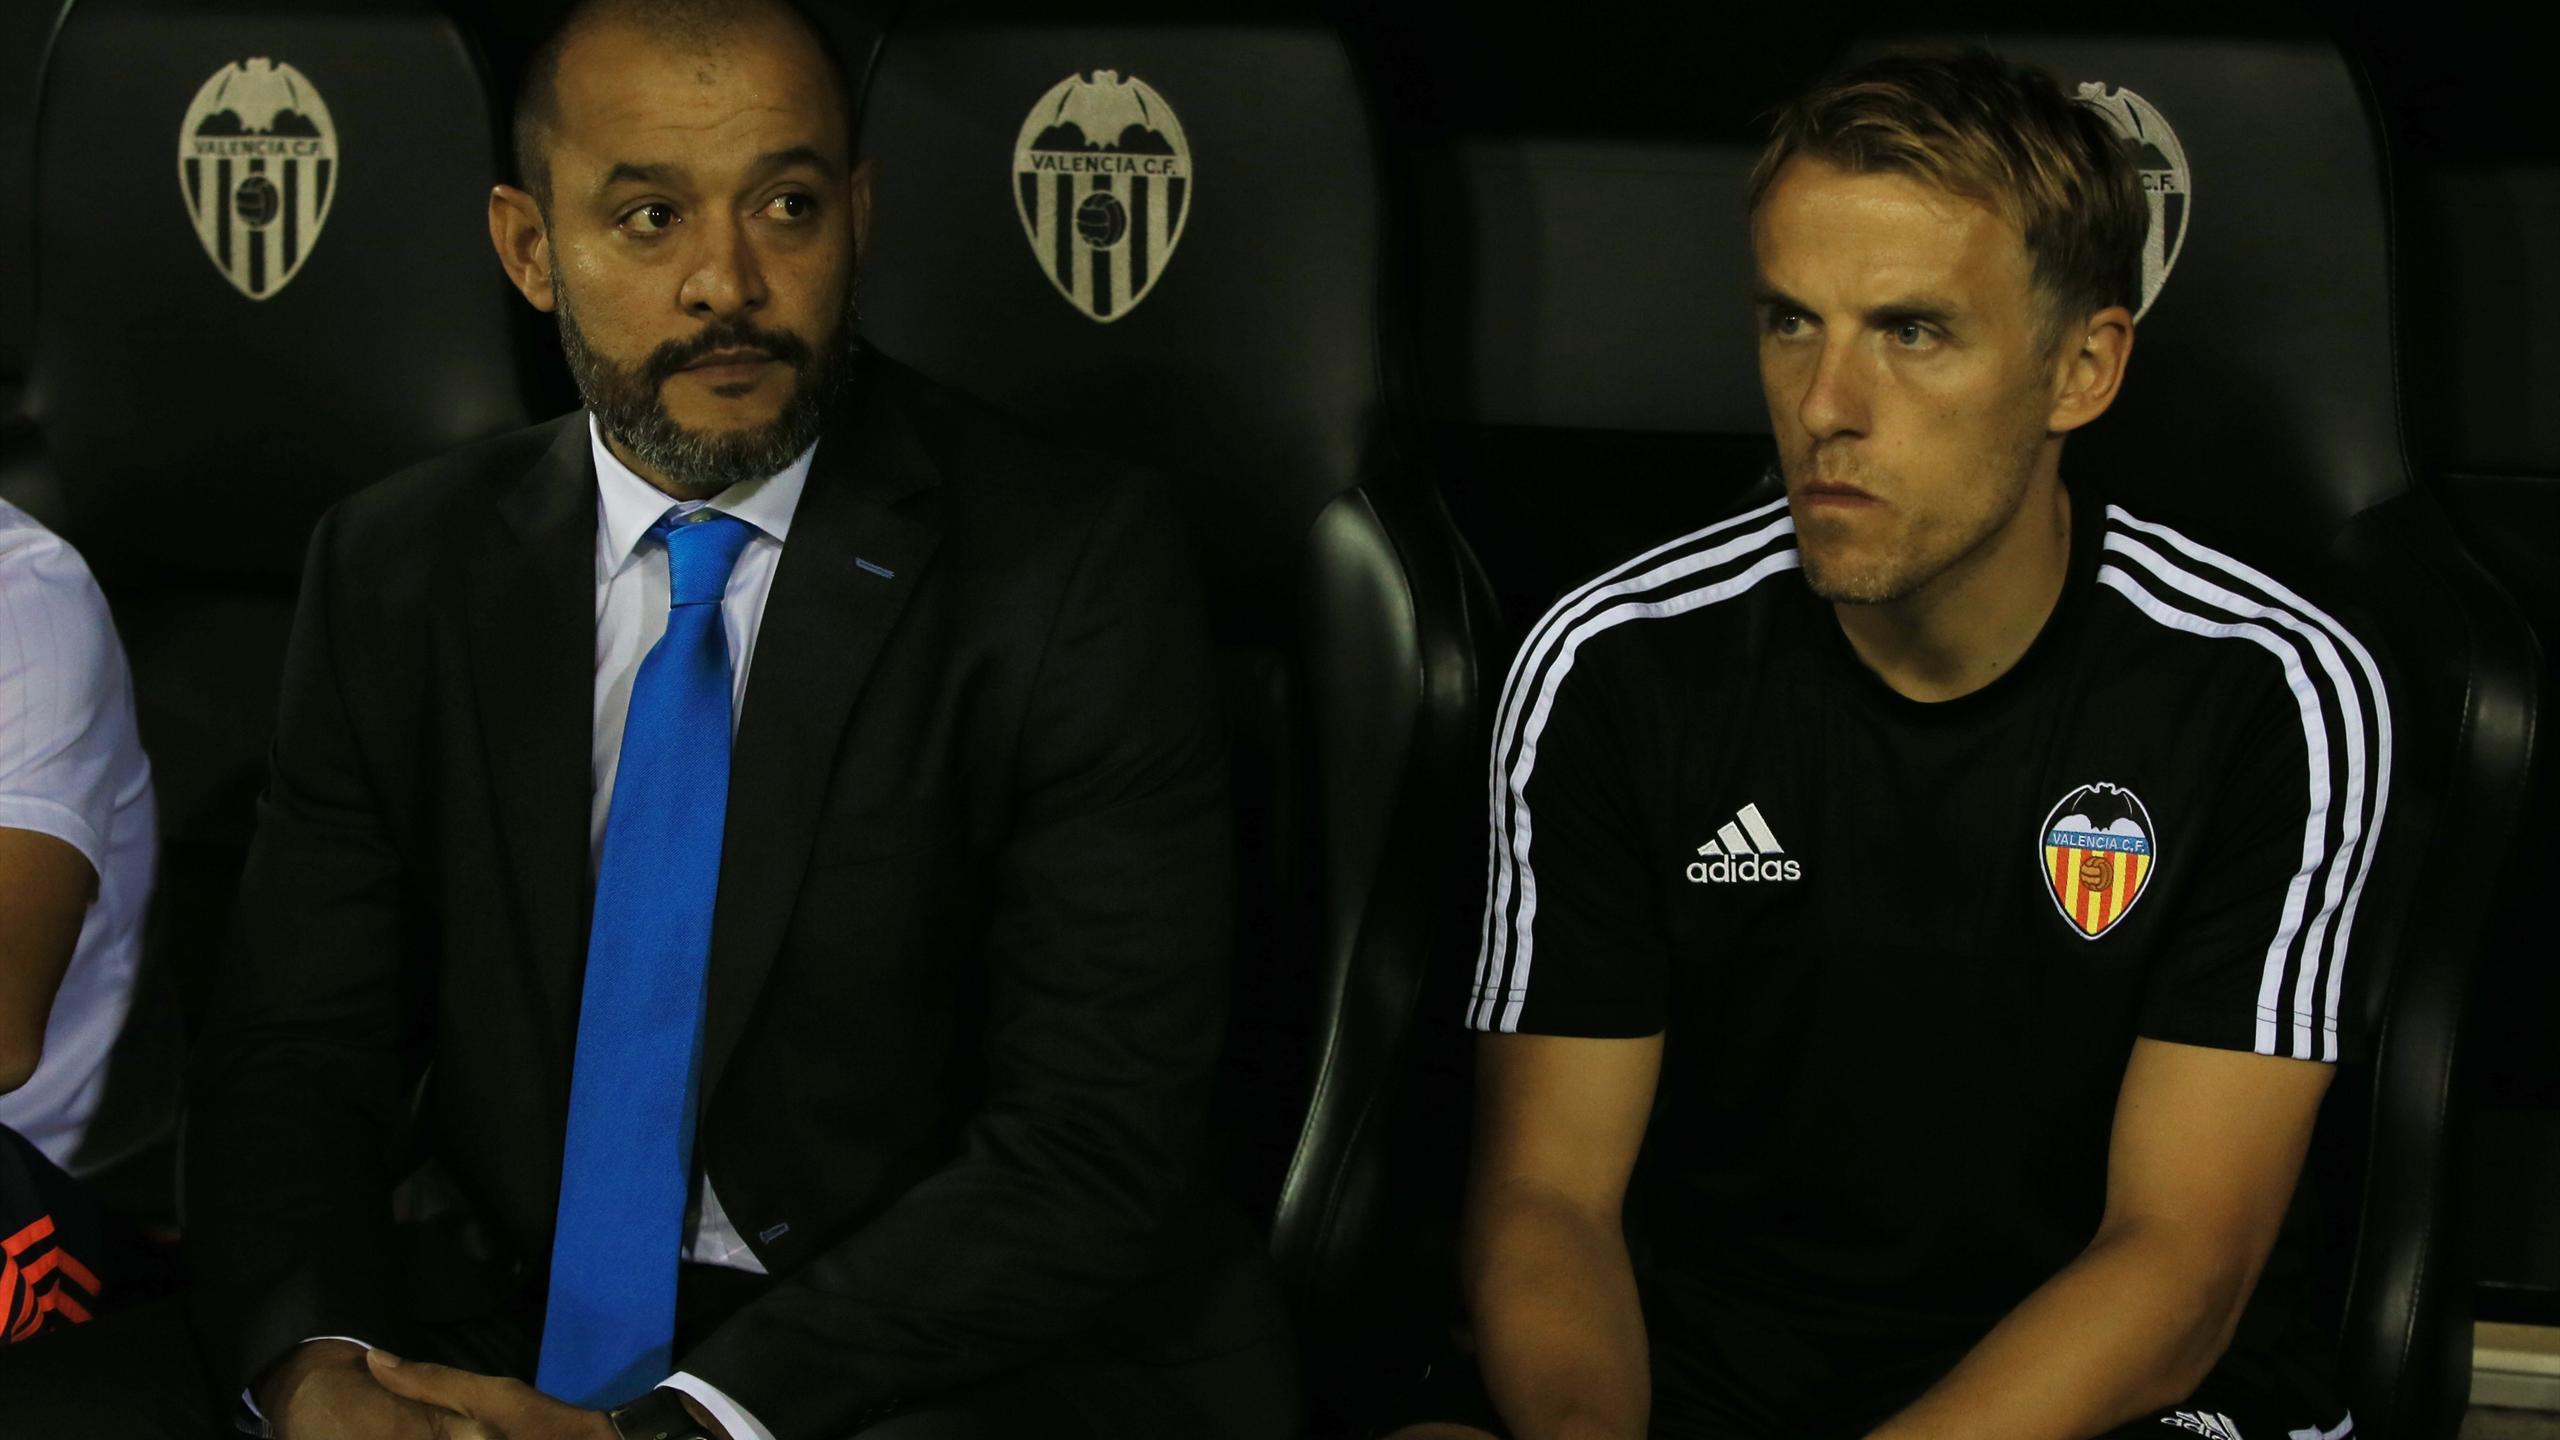 Valencia's Nuno Espirito Santo and Phil Neville